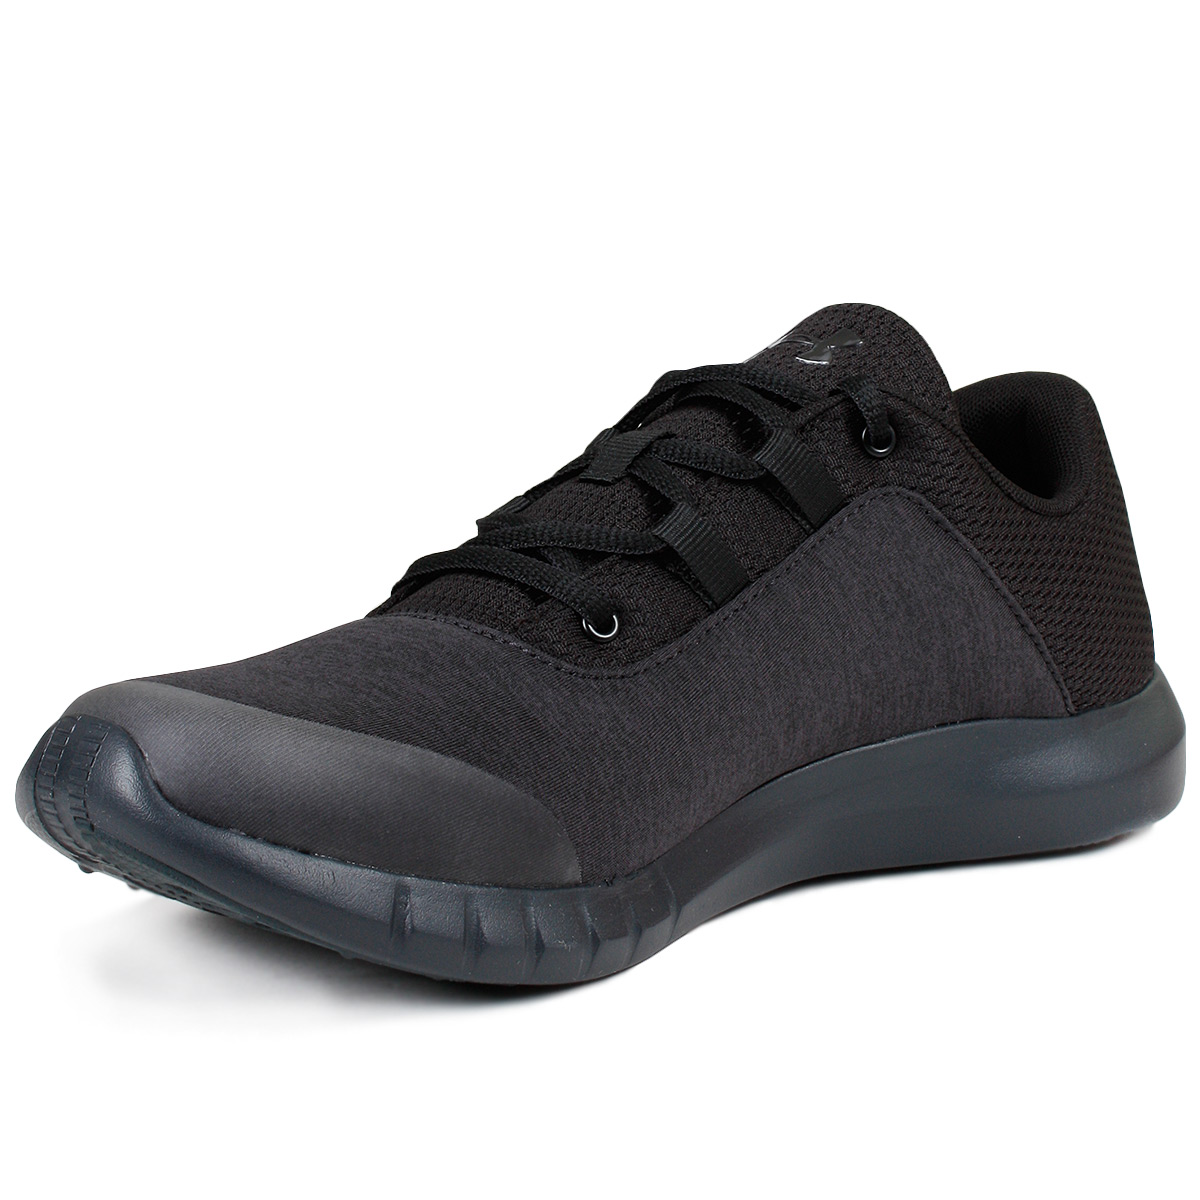 Shoes Training Trainers Sports Mens Ua Running Mojo Gym Armour Under 48wqz1Rz